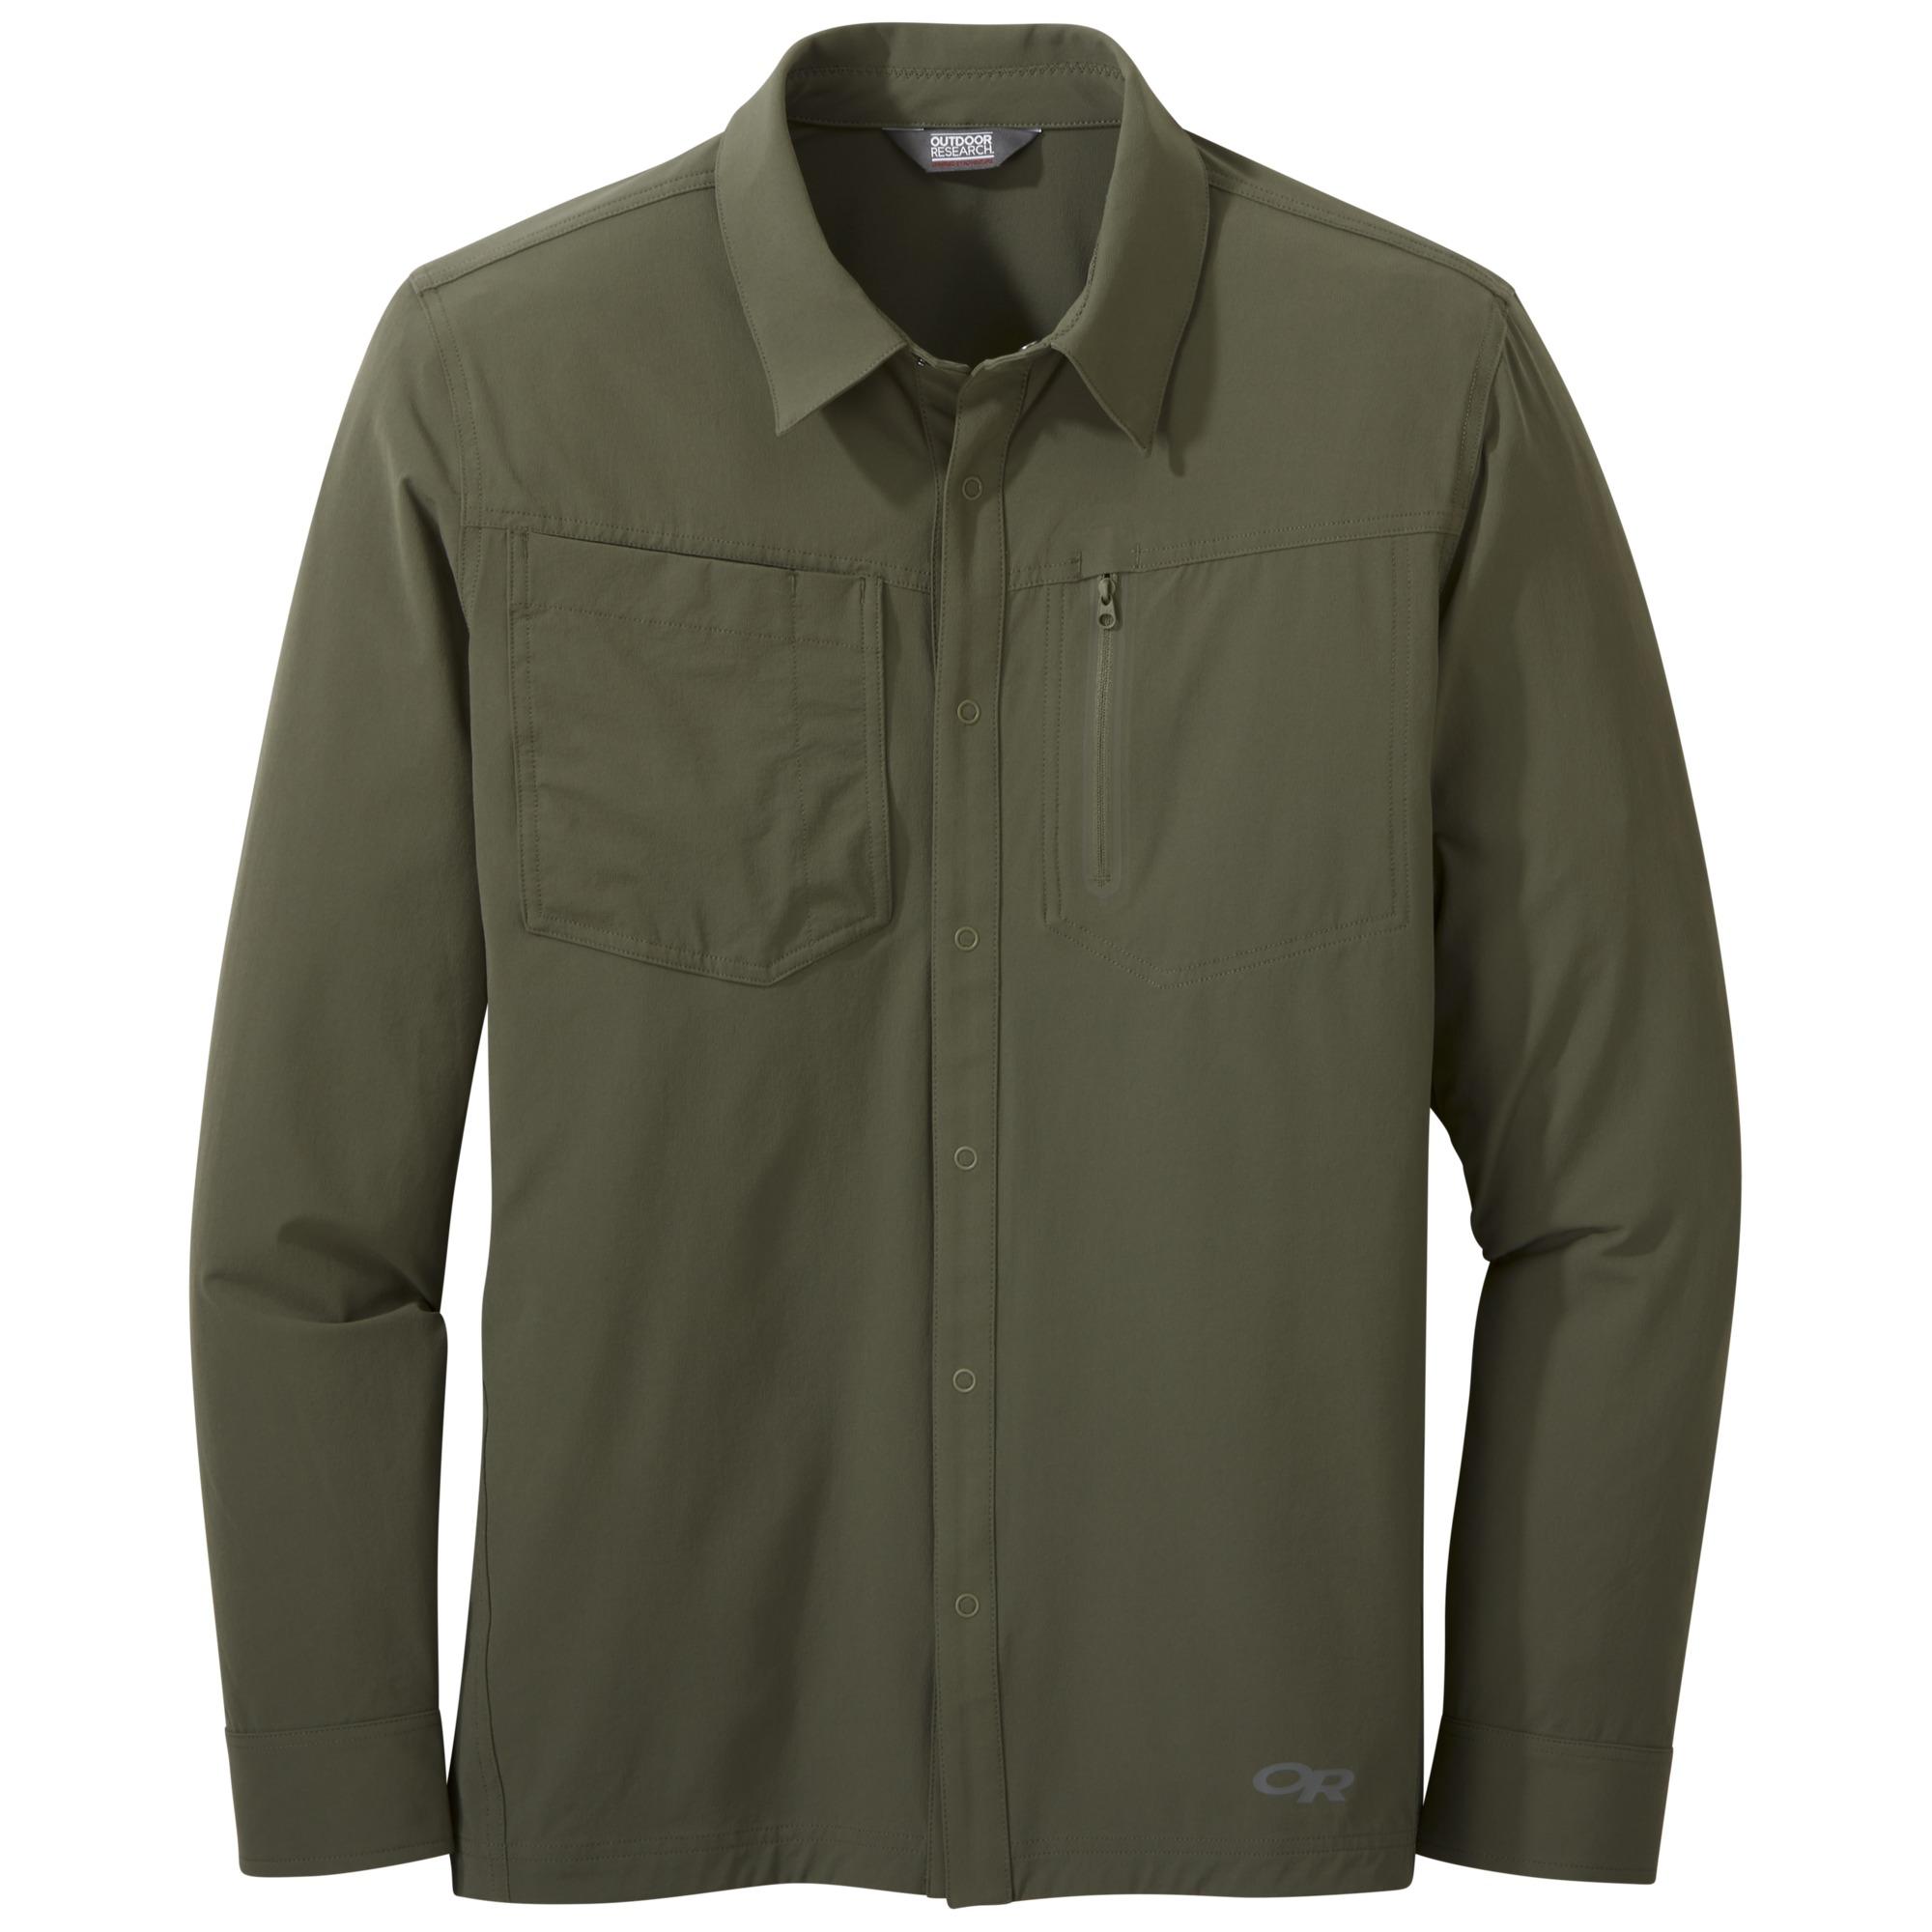 Ferrosi Shirt Jacket - Men's